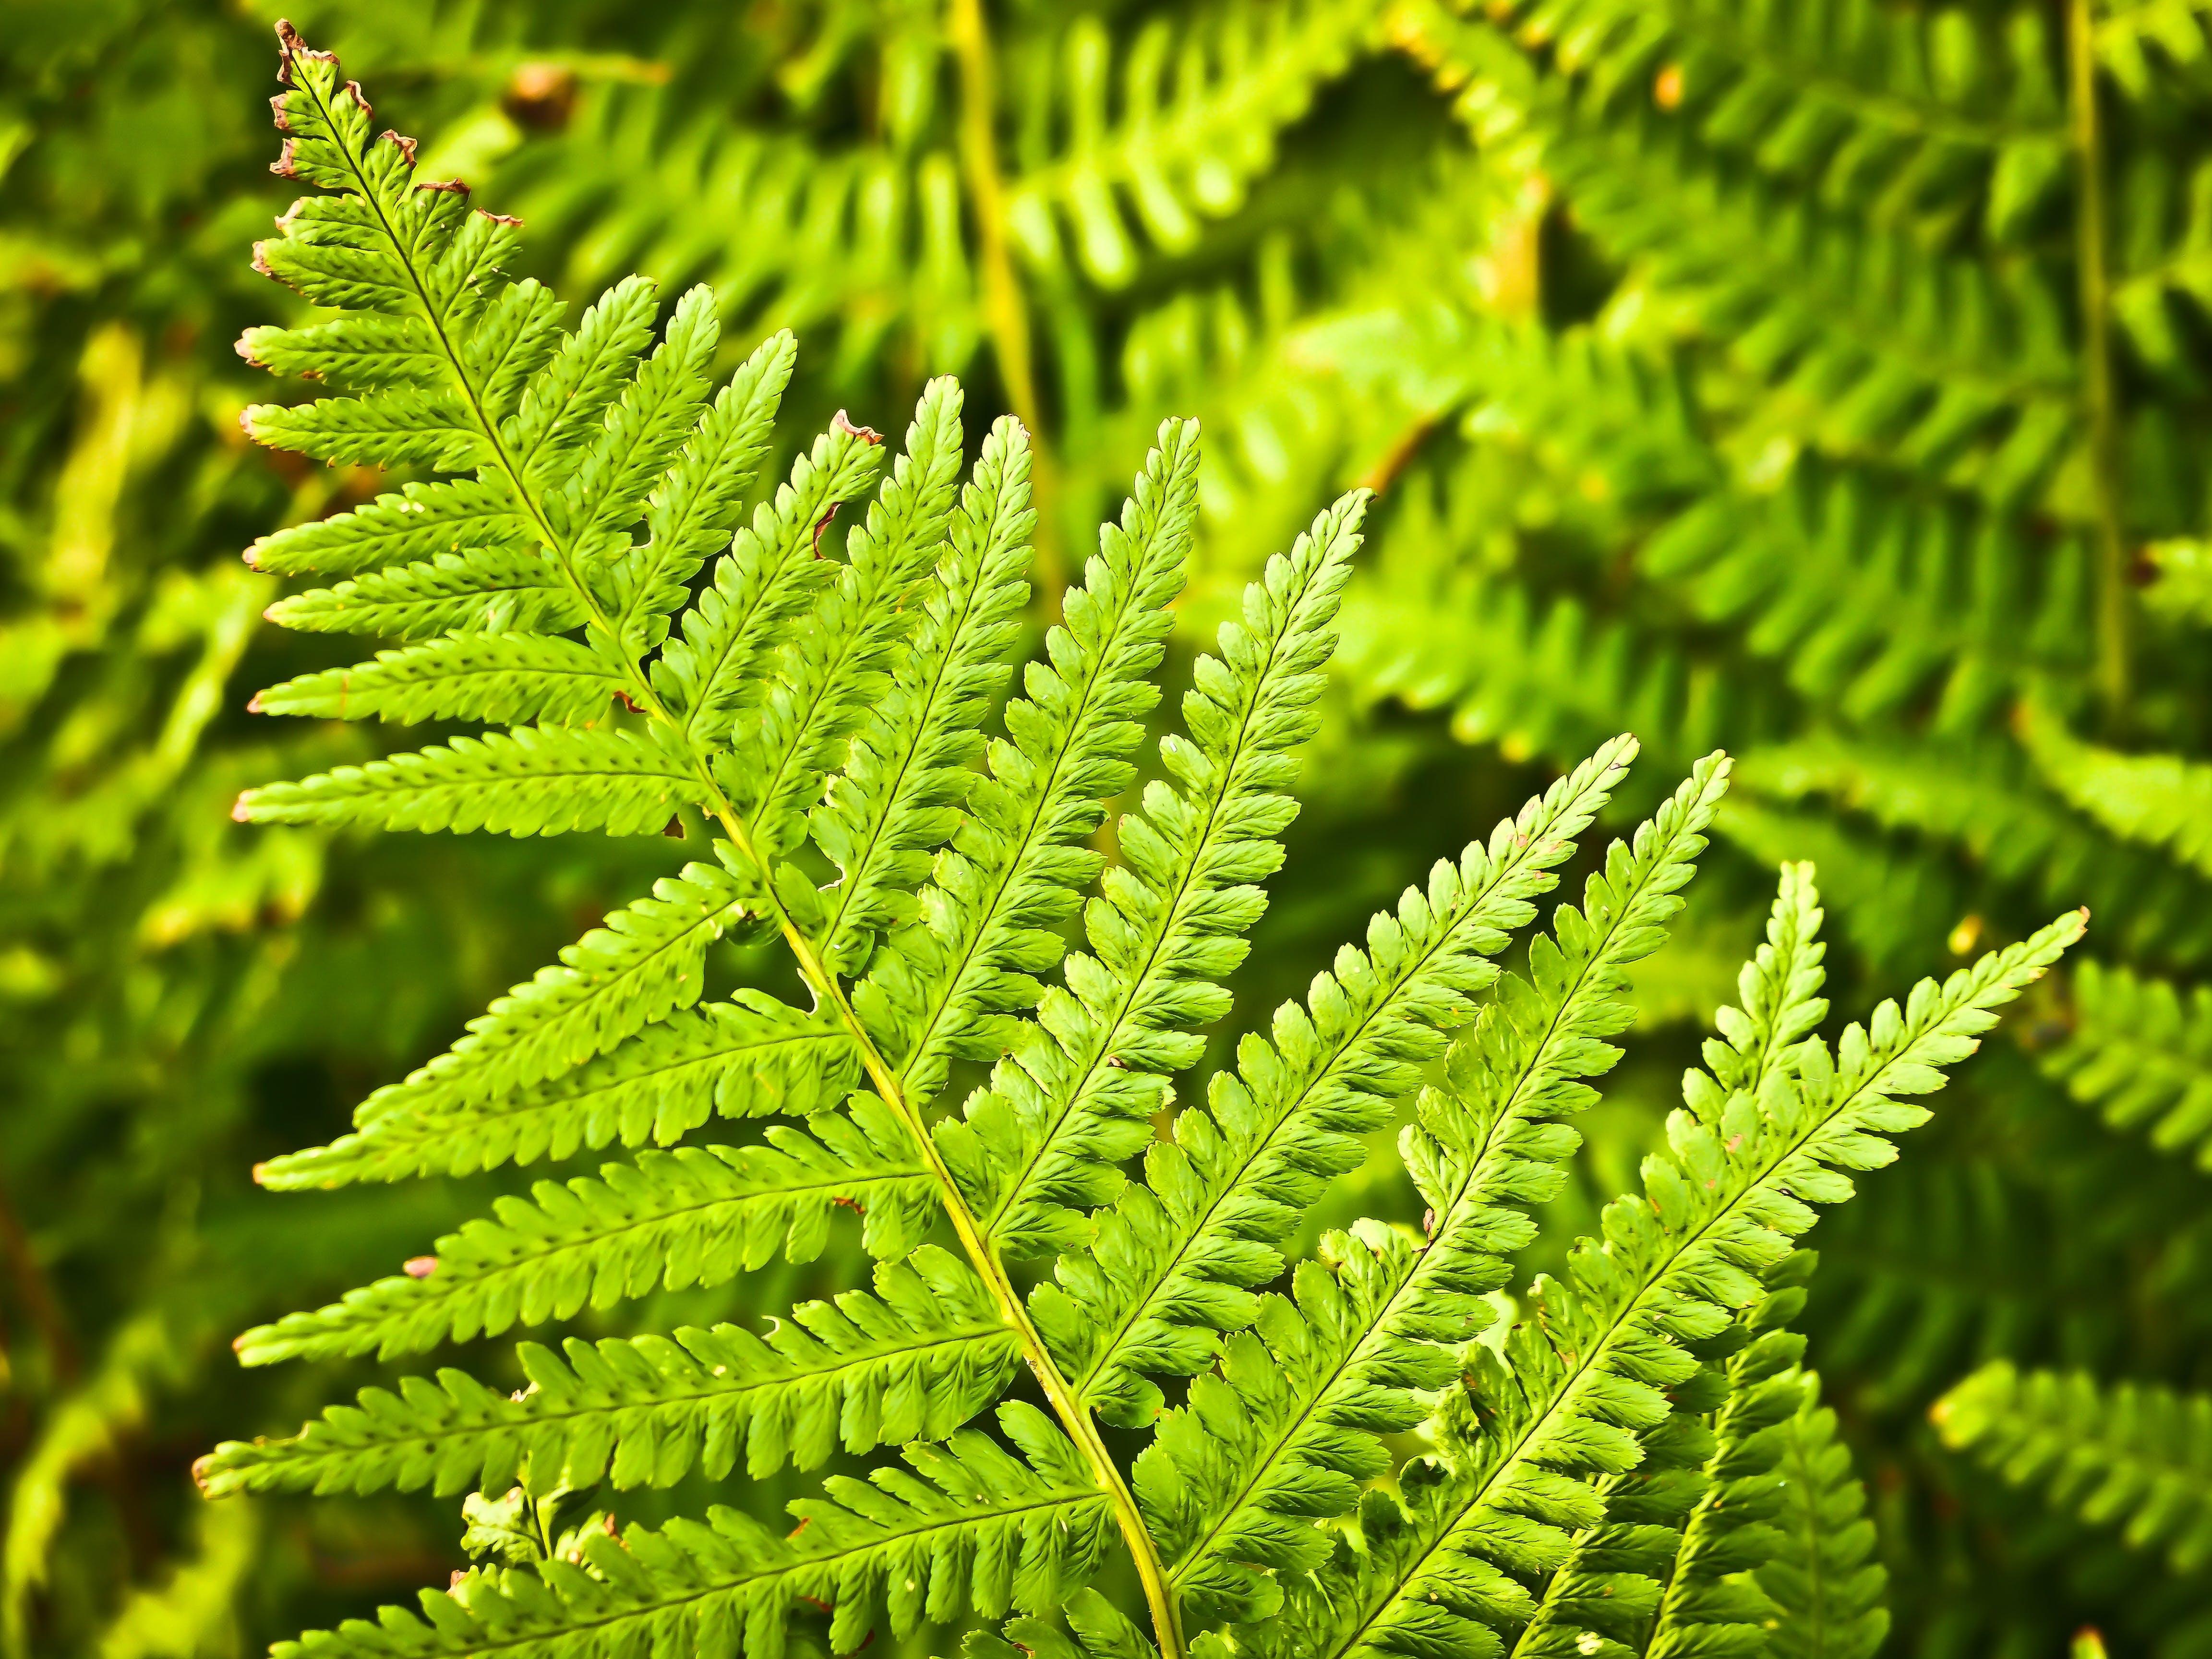 botani, ekosistem, flora